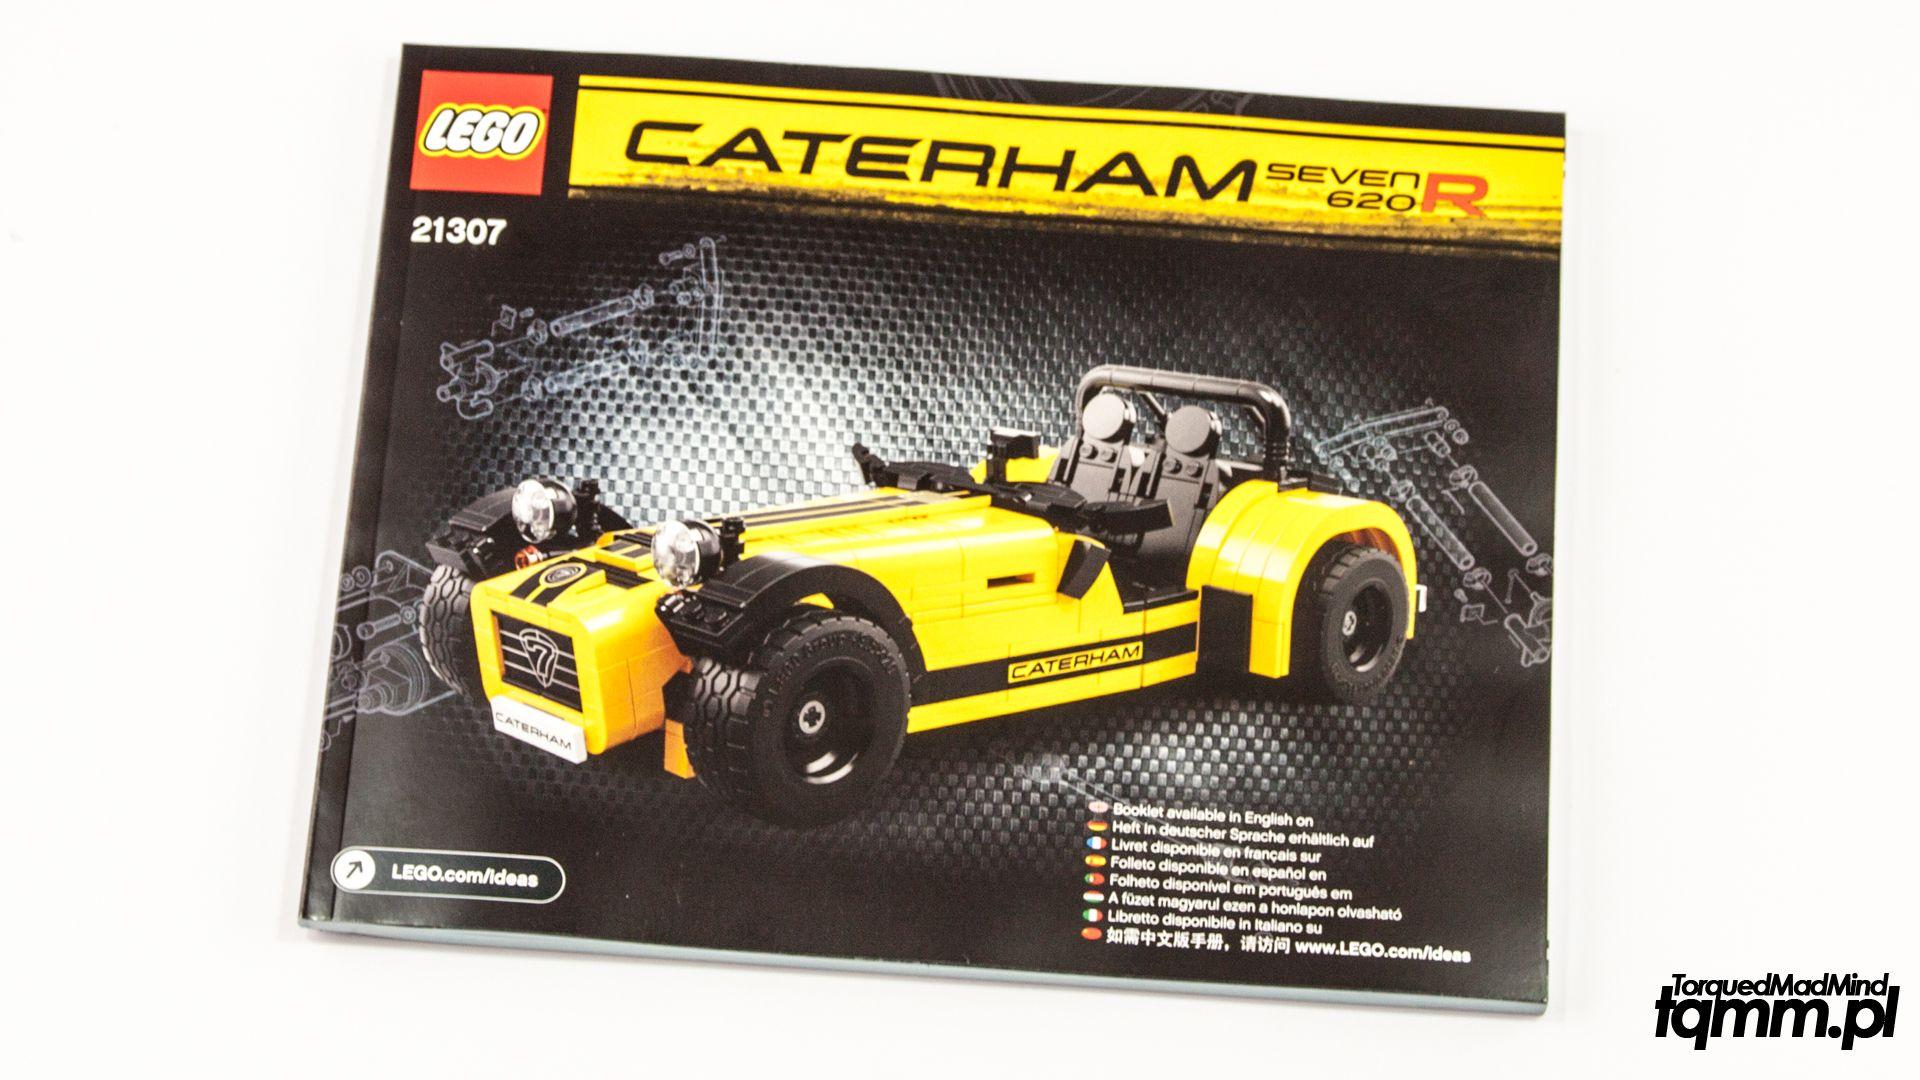 Fotki #84: LEGO Caterham Seven 620R 21307